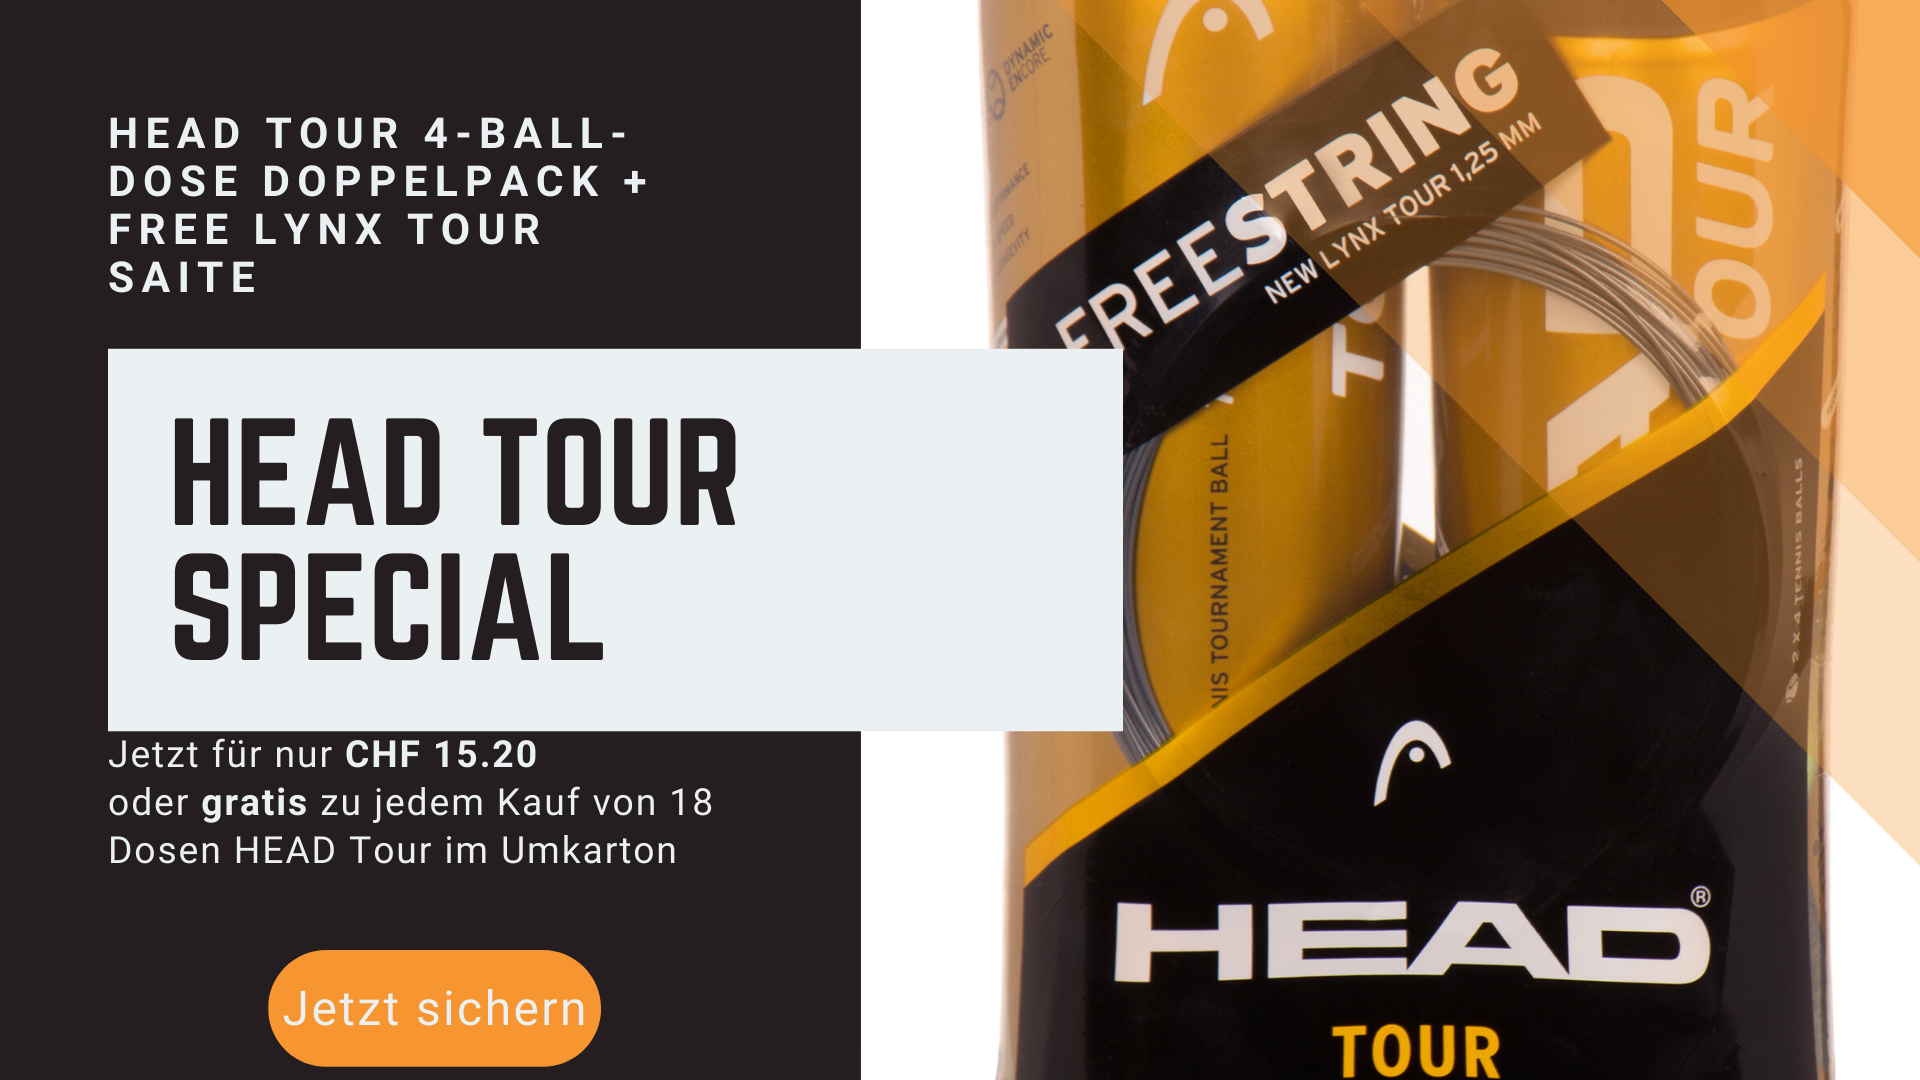 HEAD Tour Special